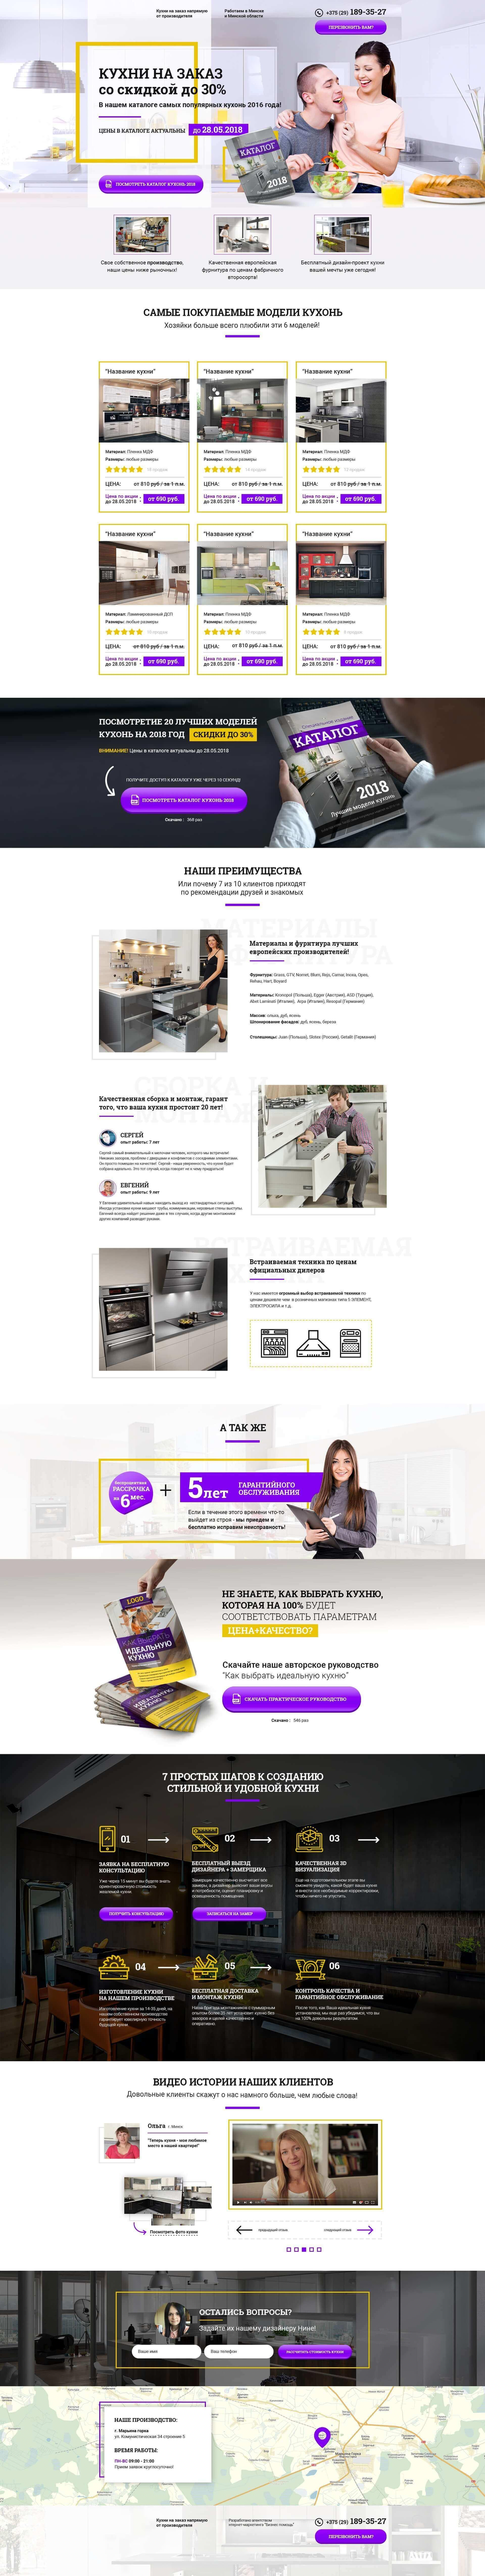 Макет (шаблон) Landing page - Кухни на заказ